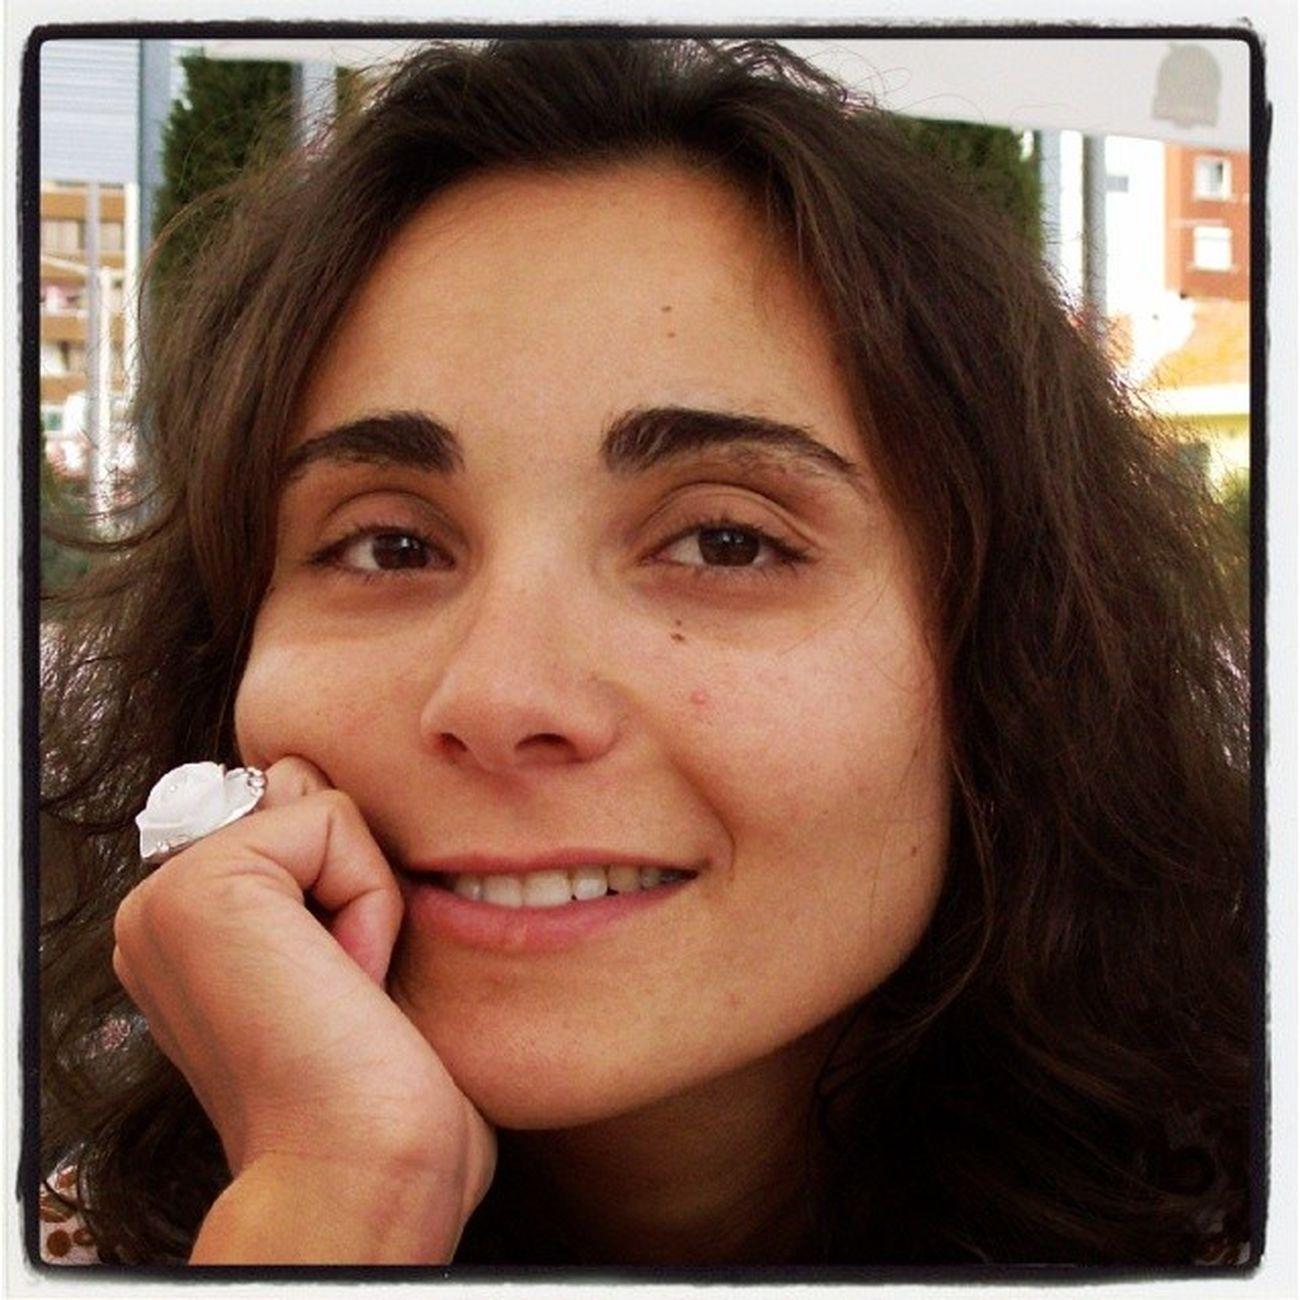 Cláudia Waw Friends Cute Portuguesegirl portugalmargemsulmiratejocorroios